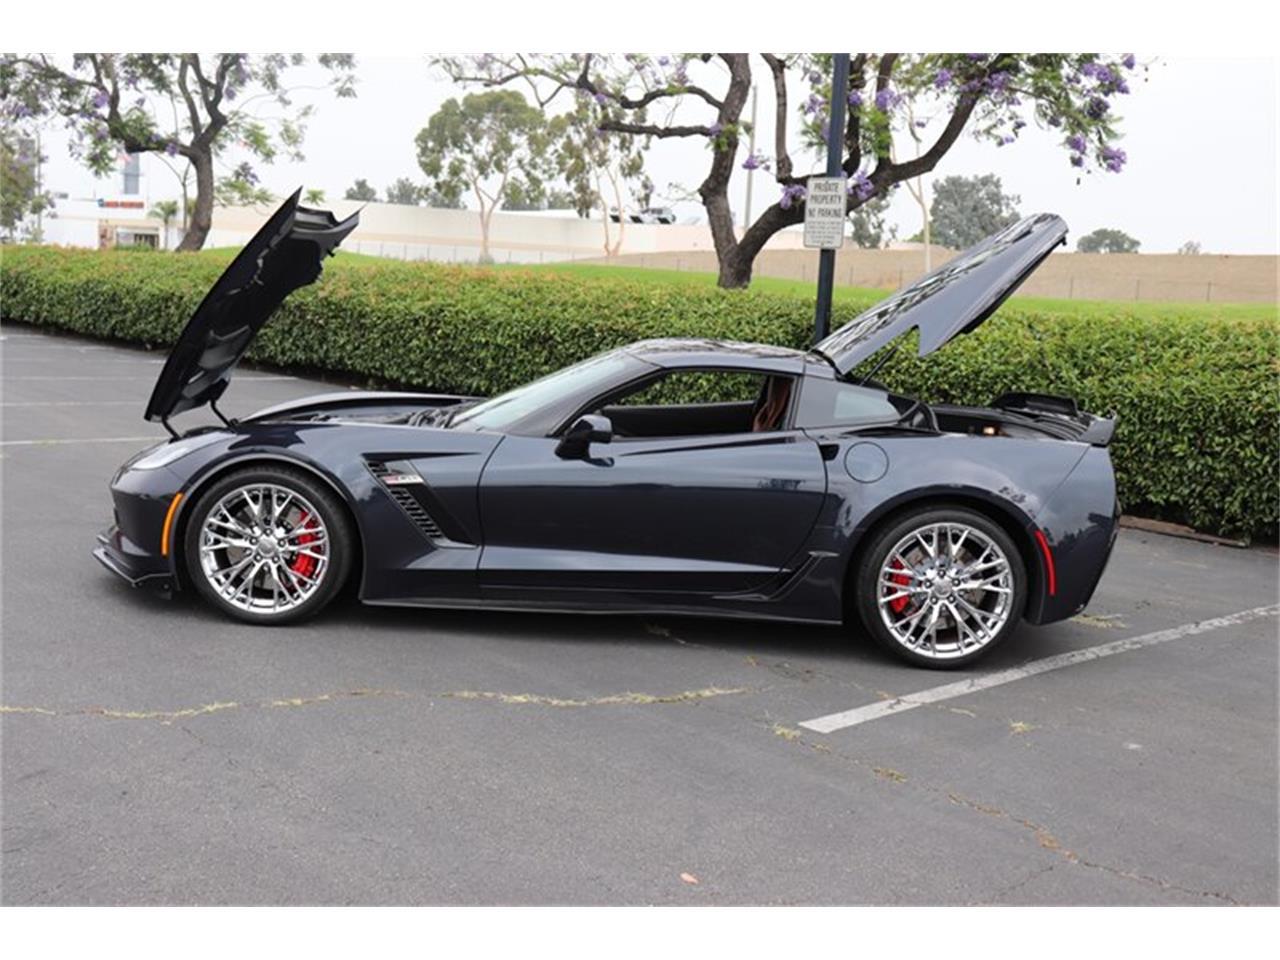 Large Picture of 2015 Corvette Z06 - $59,995.00 Offered by West Coast Corvettes - QFLK